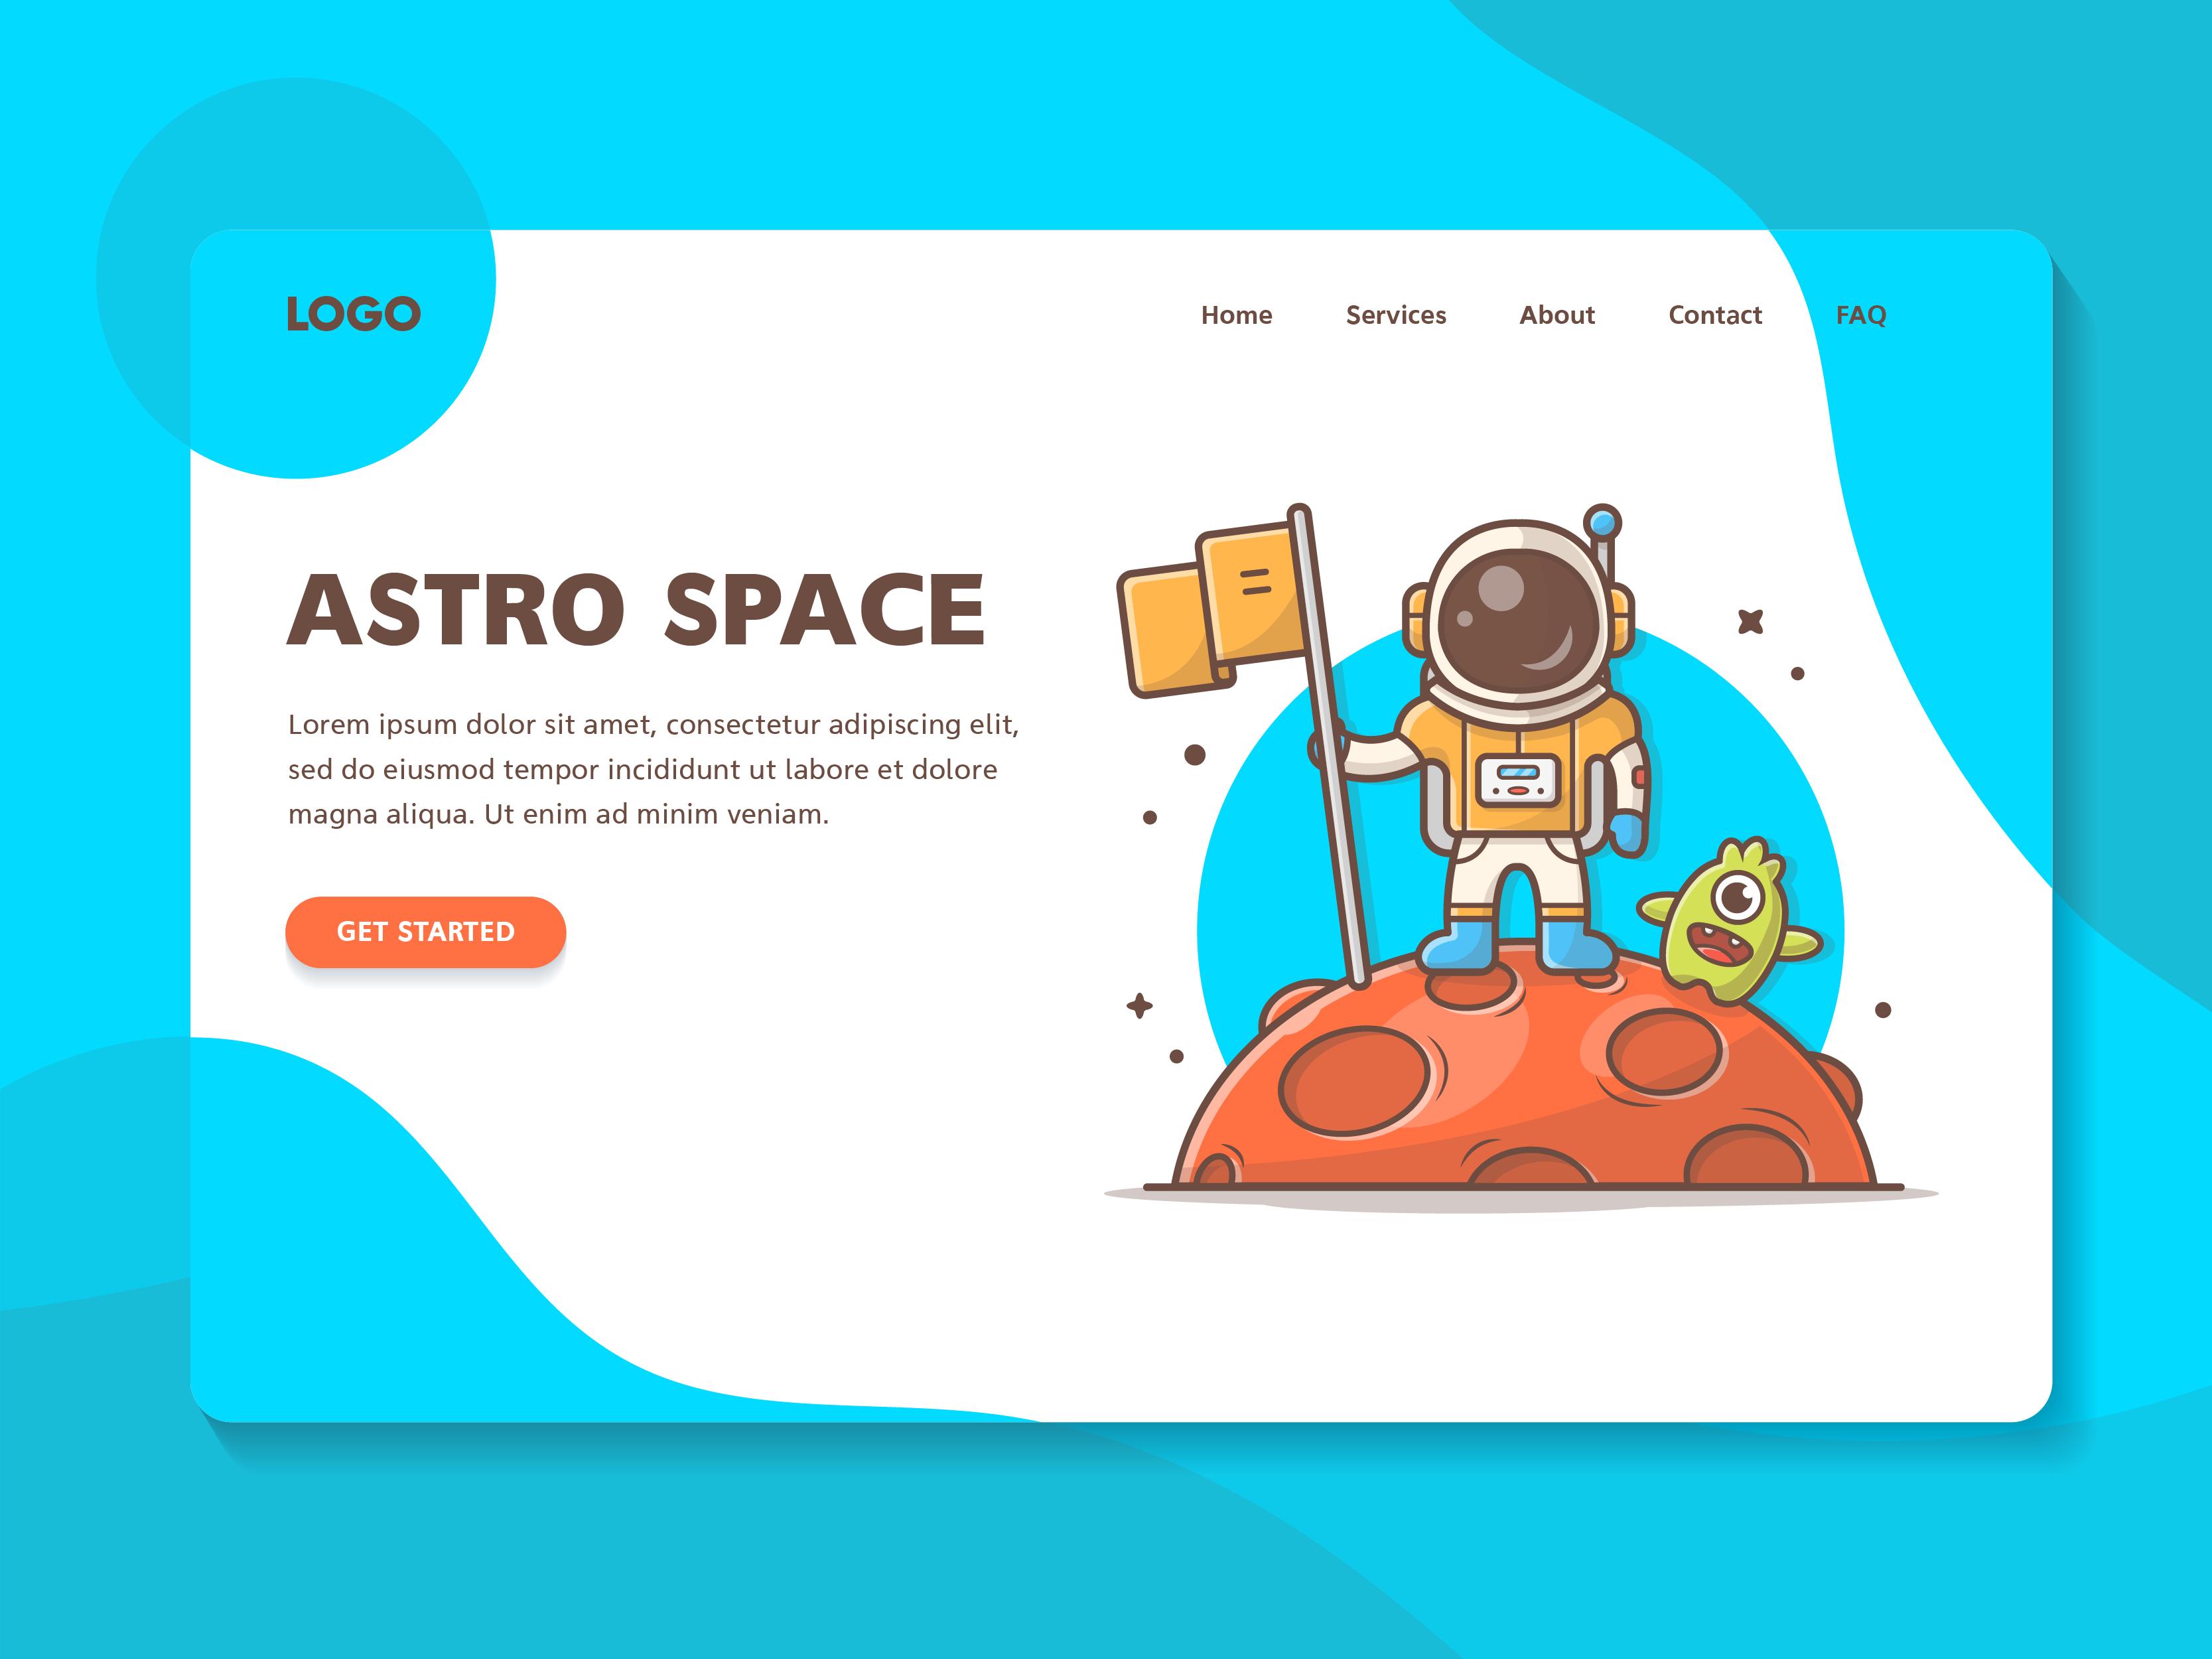 Astro standing on moon dribbble 06